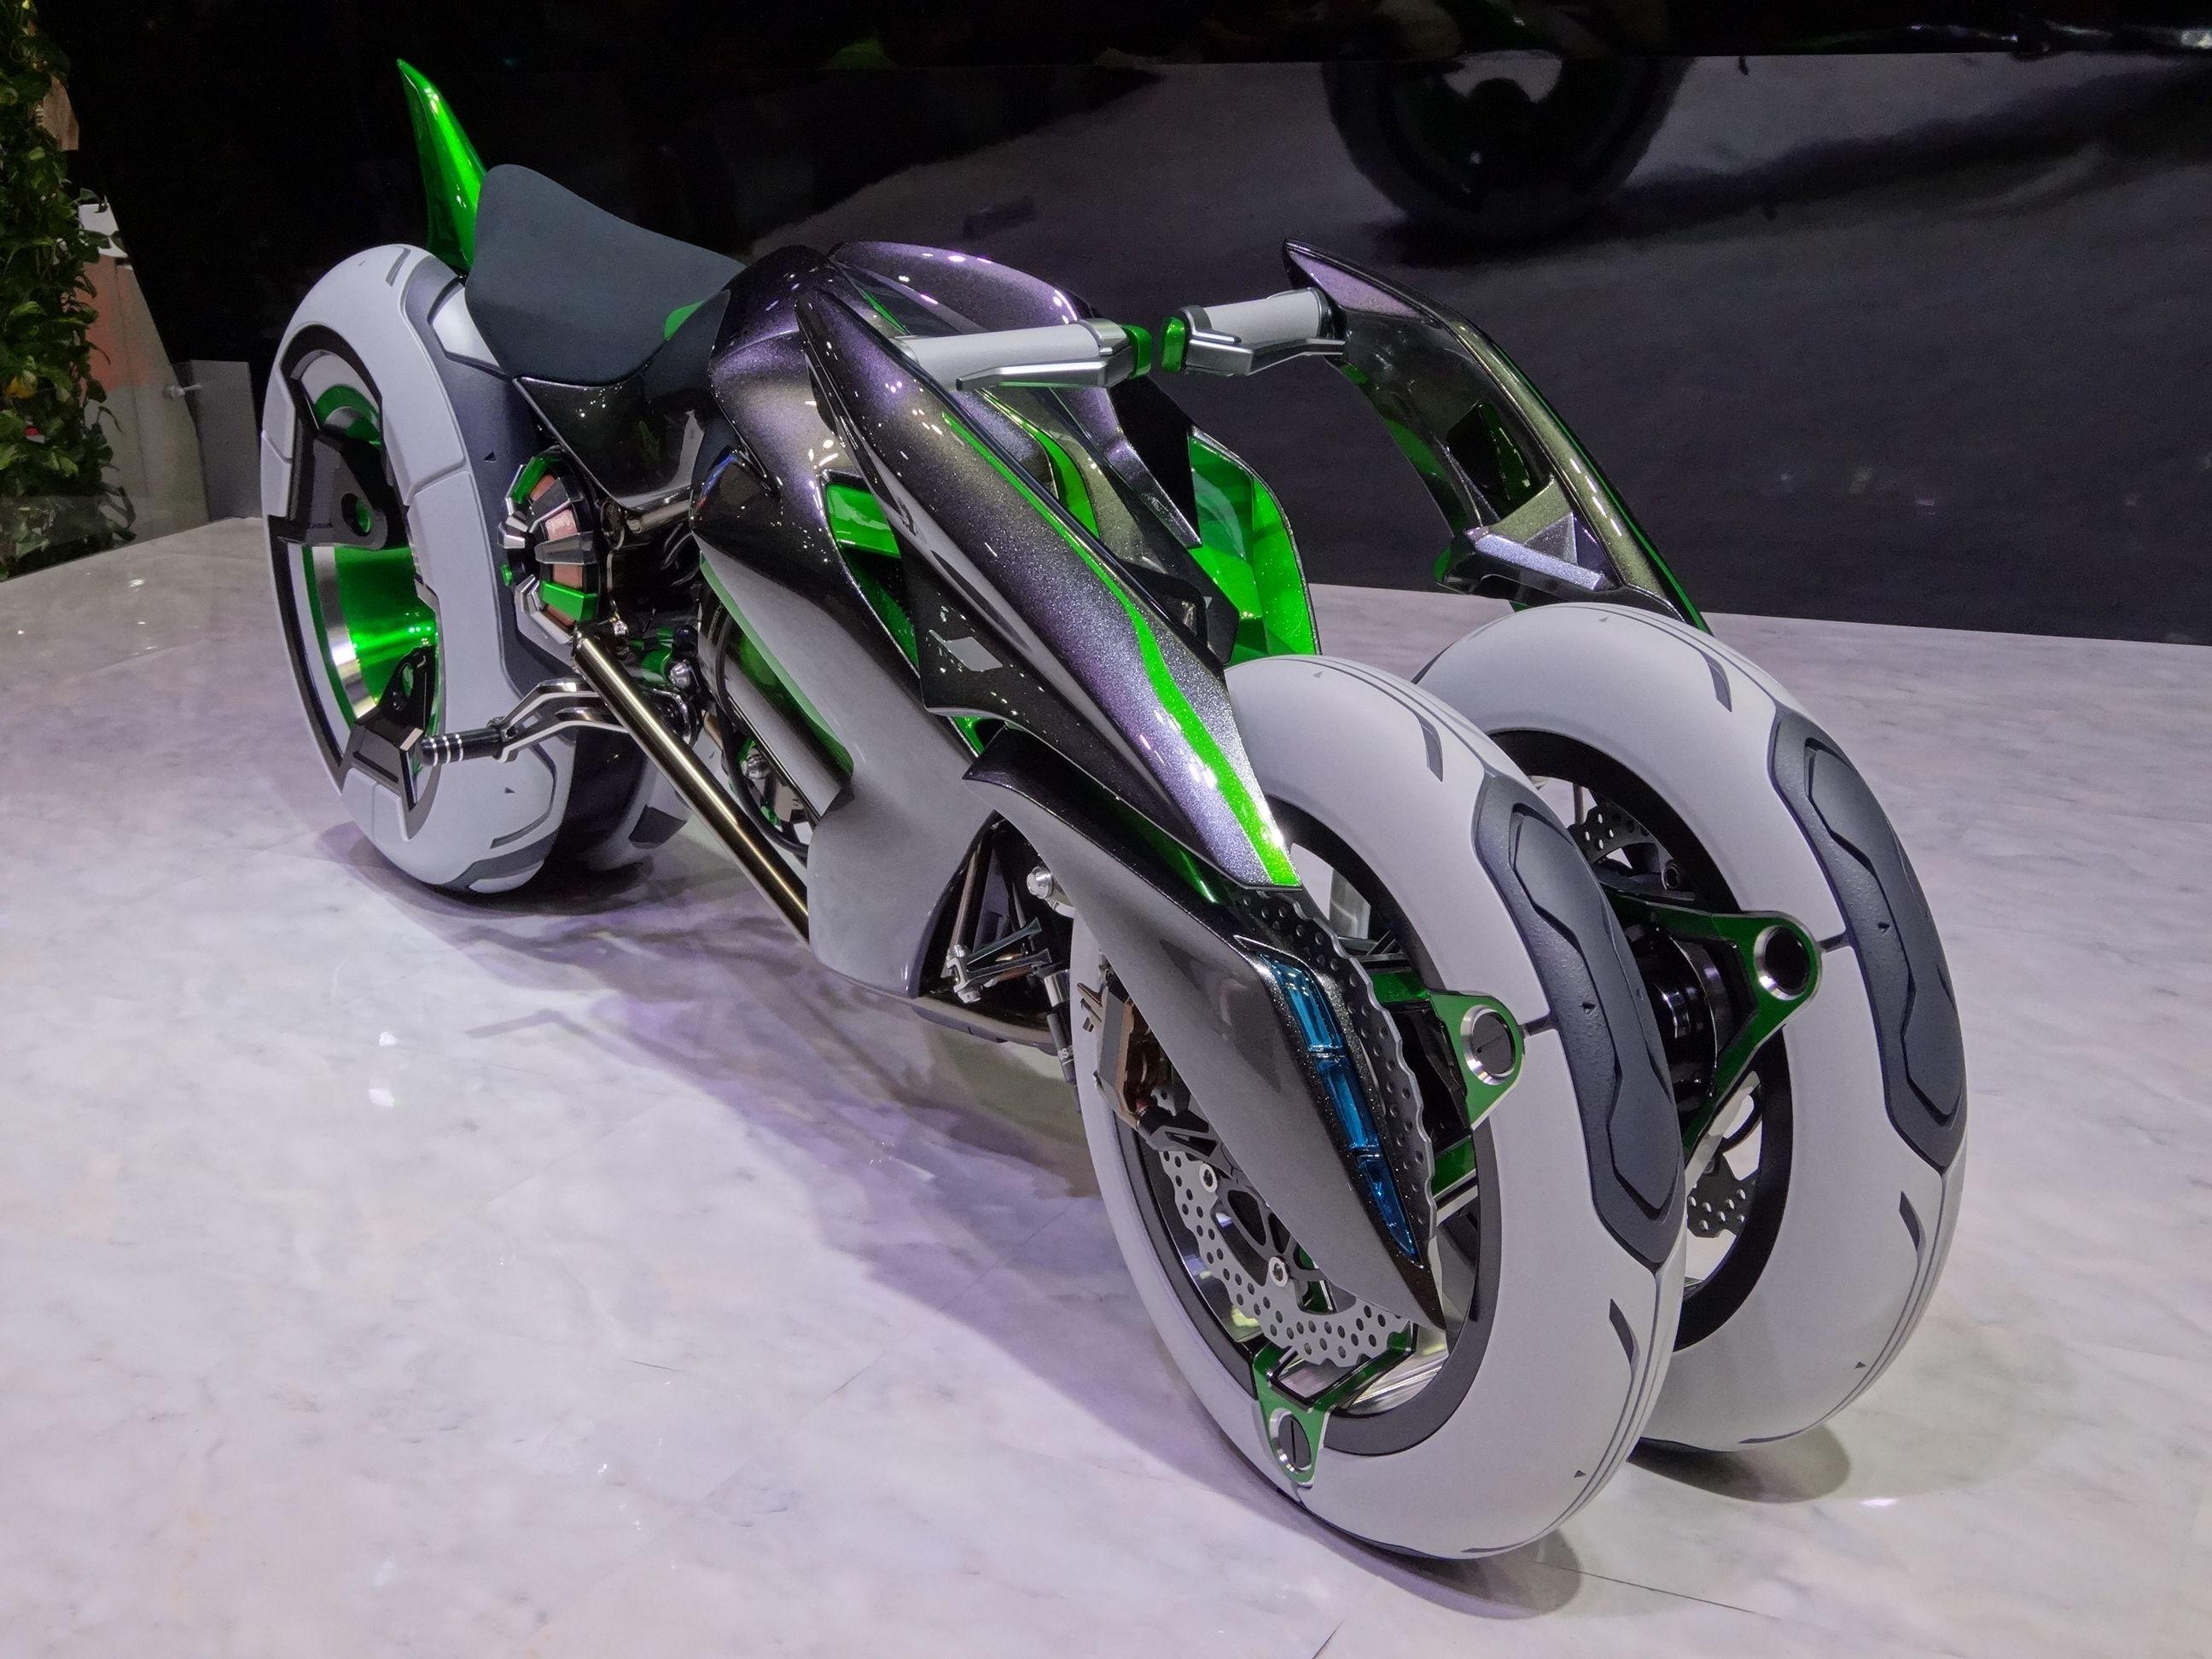 Kawasaki 3 Wheel Motorcycle Year Of Clean Water